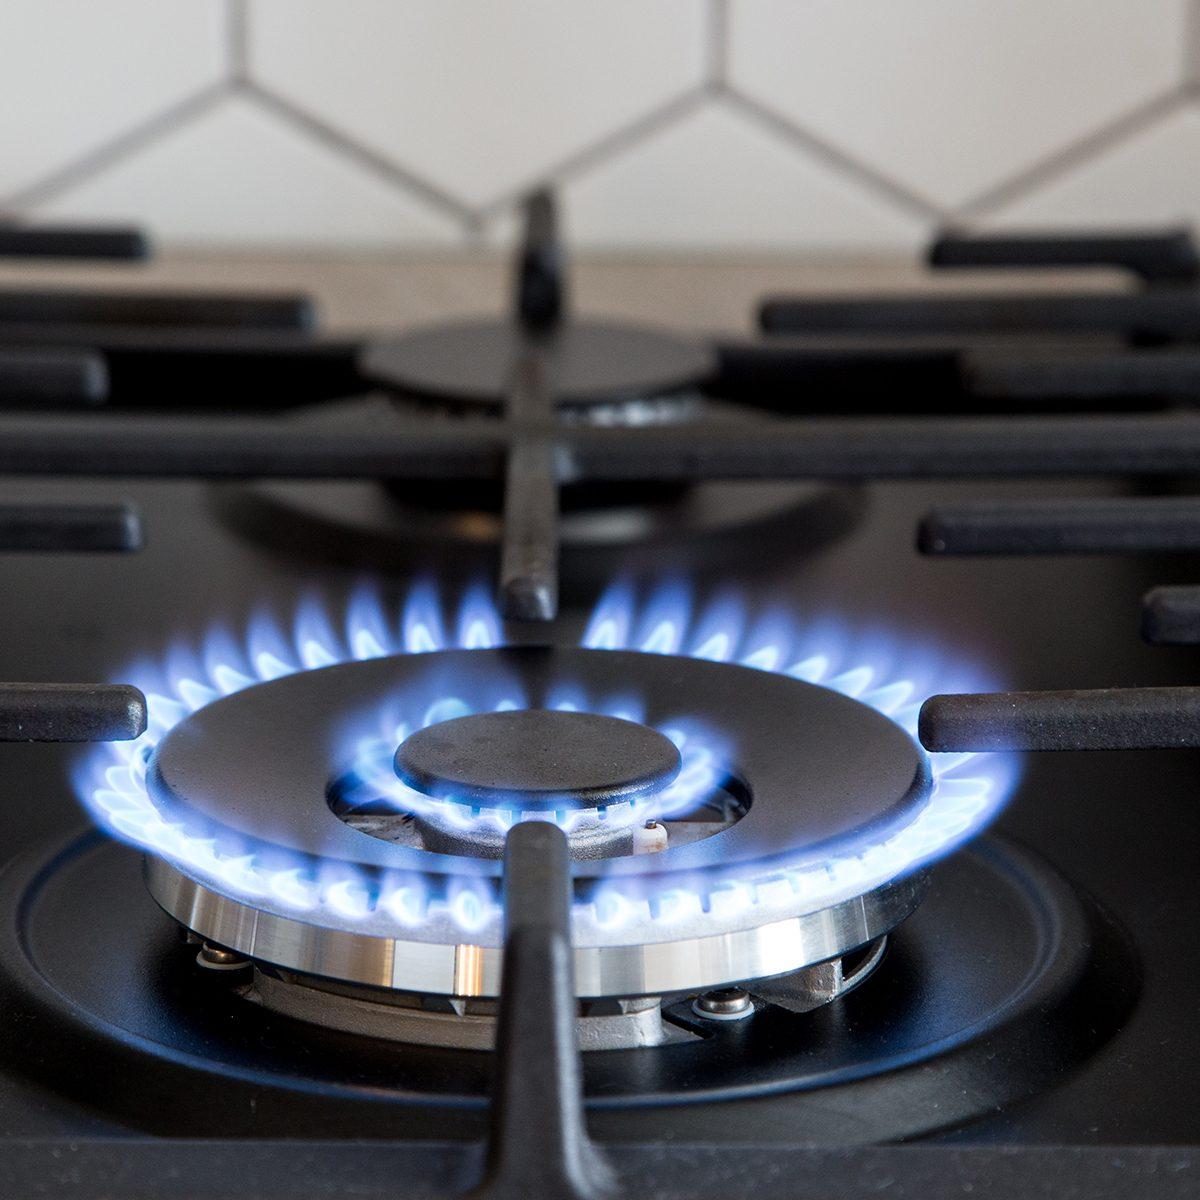 Gas burner on black modern kitchen stove.